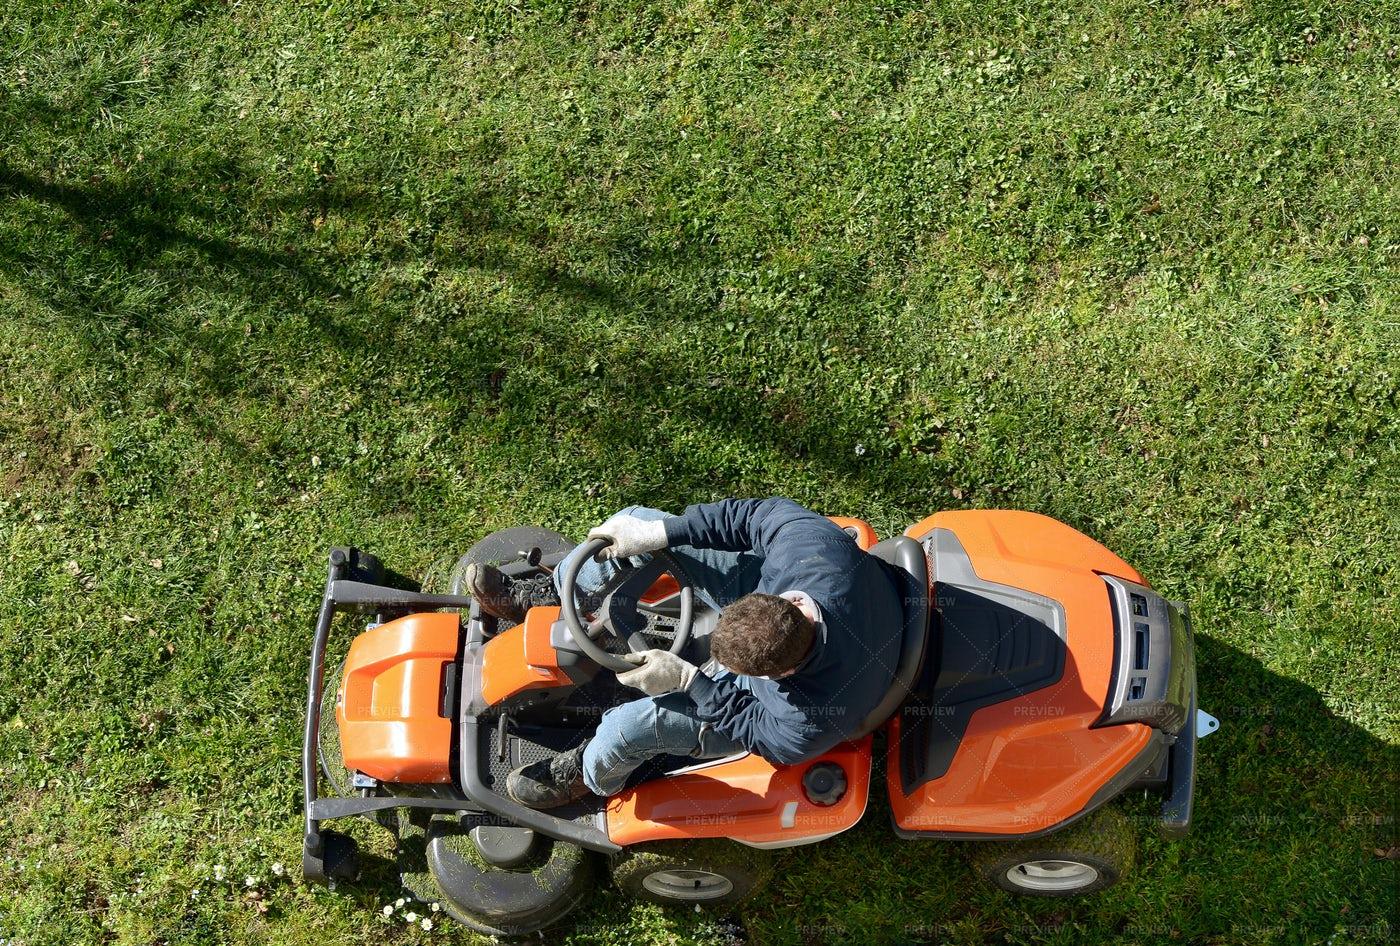 Man Mowing A Lawn: Stock Photos